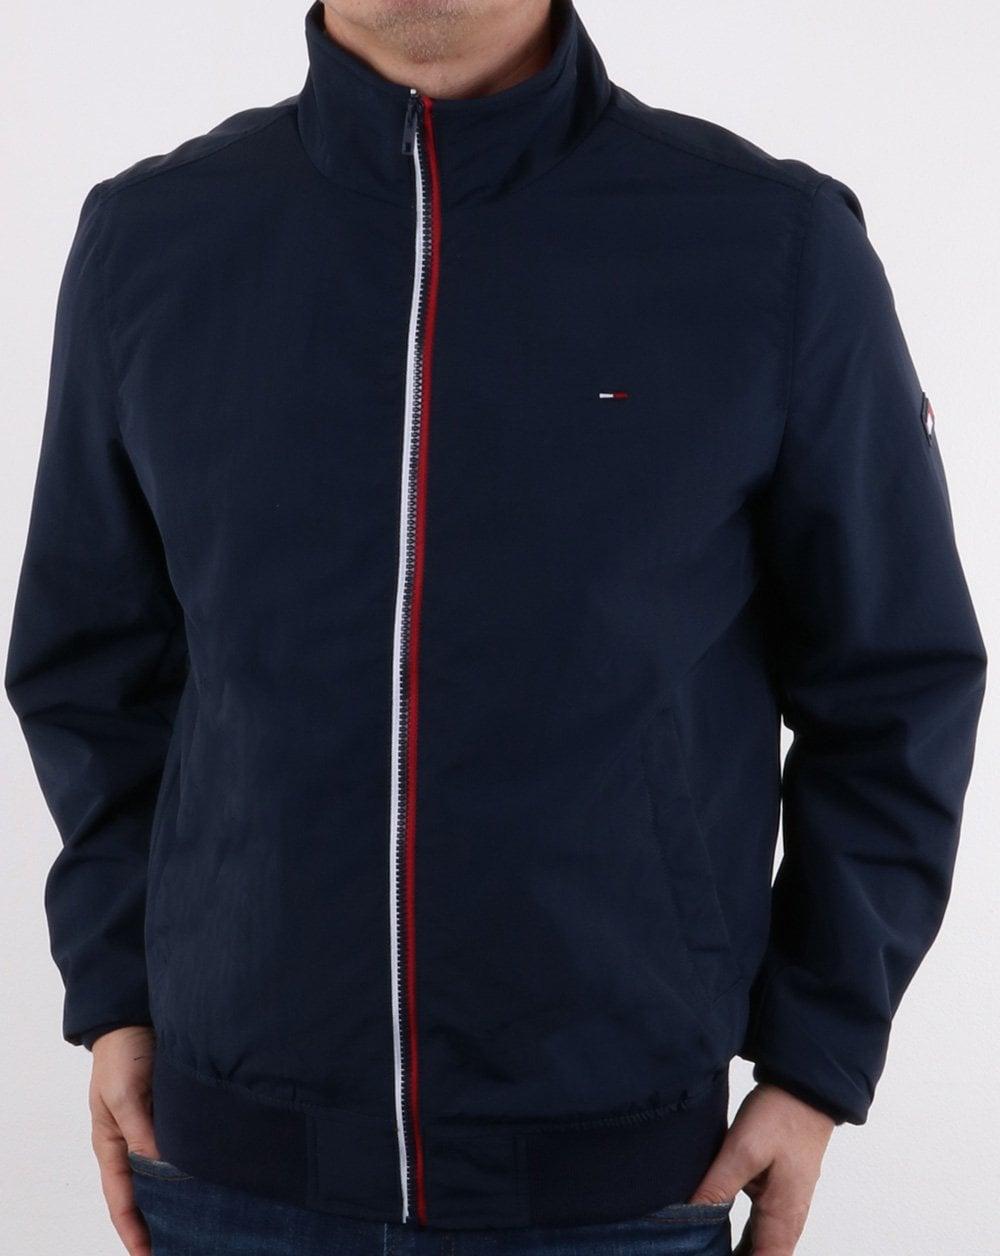 64495944fe Tommy Hilfiger Jeans Tommy Hilfiger Bomber Jacket Navy